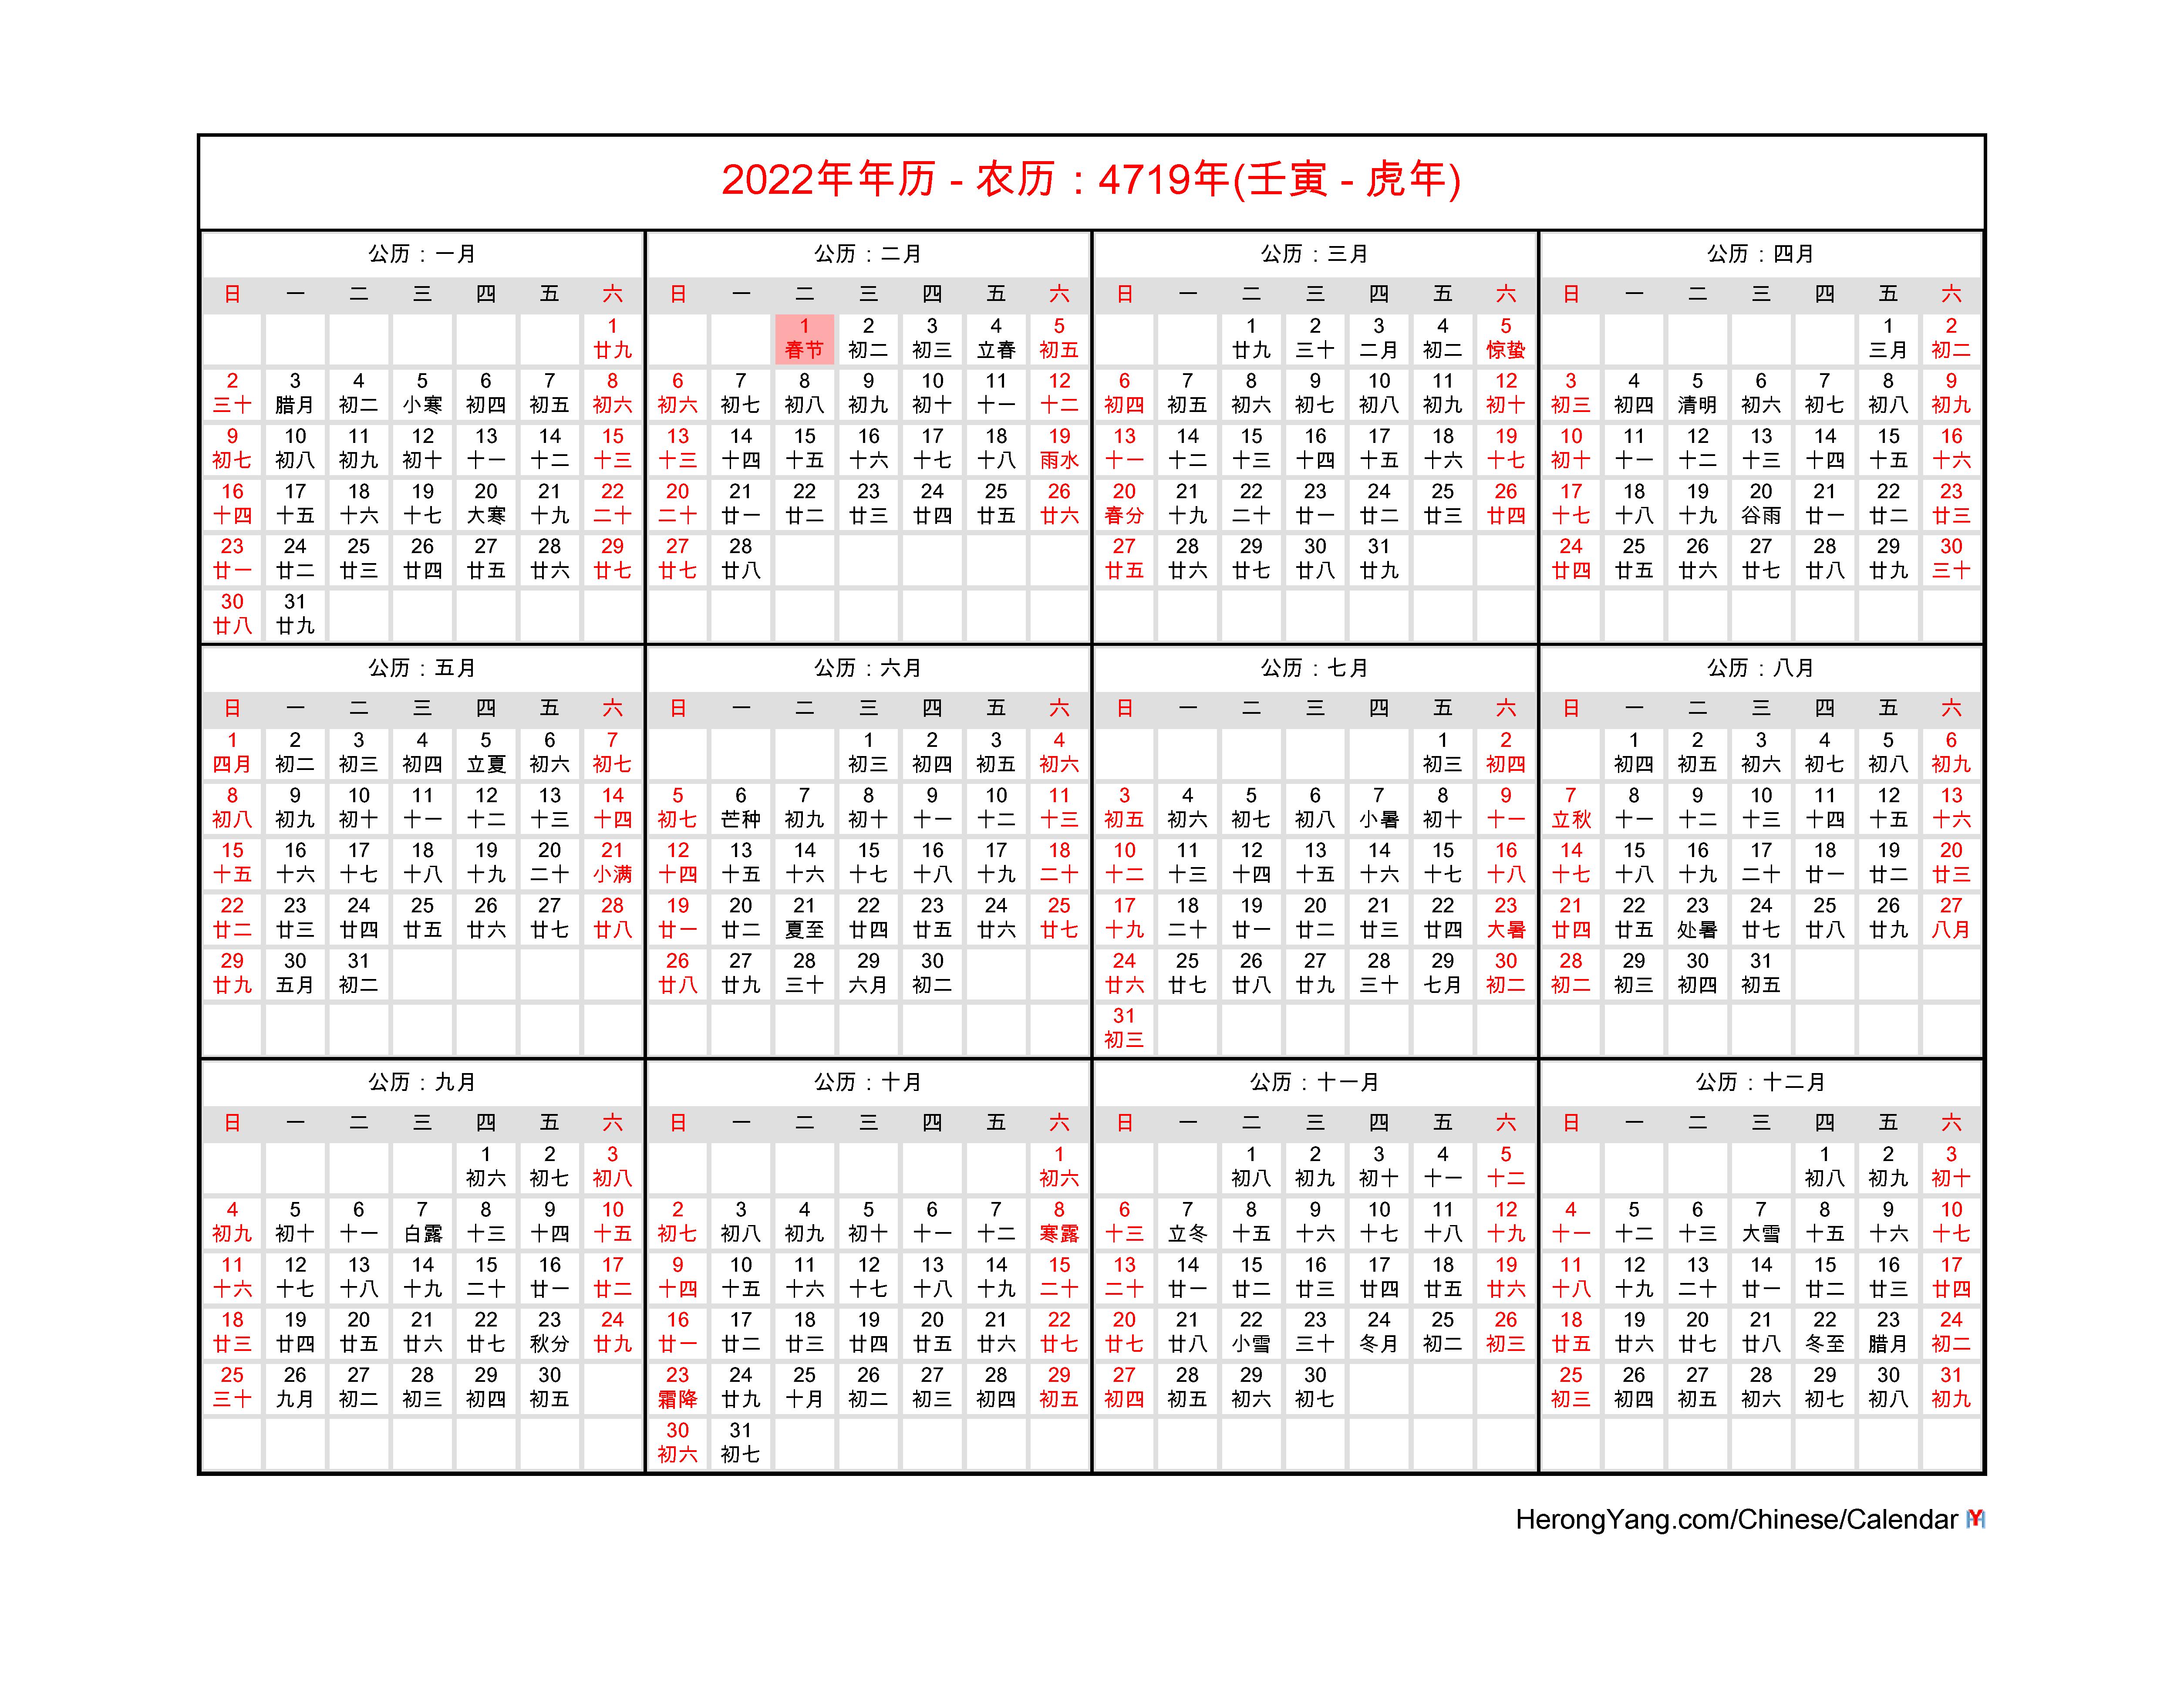 Uml Calendar Spring 2022.Free Chinese Calendar 2022 Year Of The Tiger